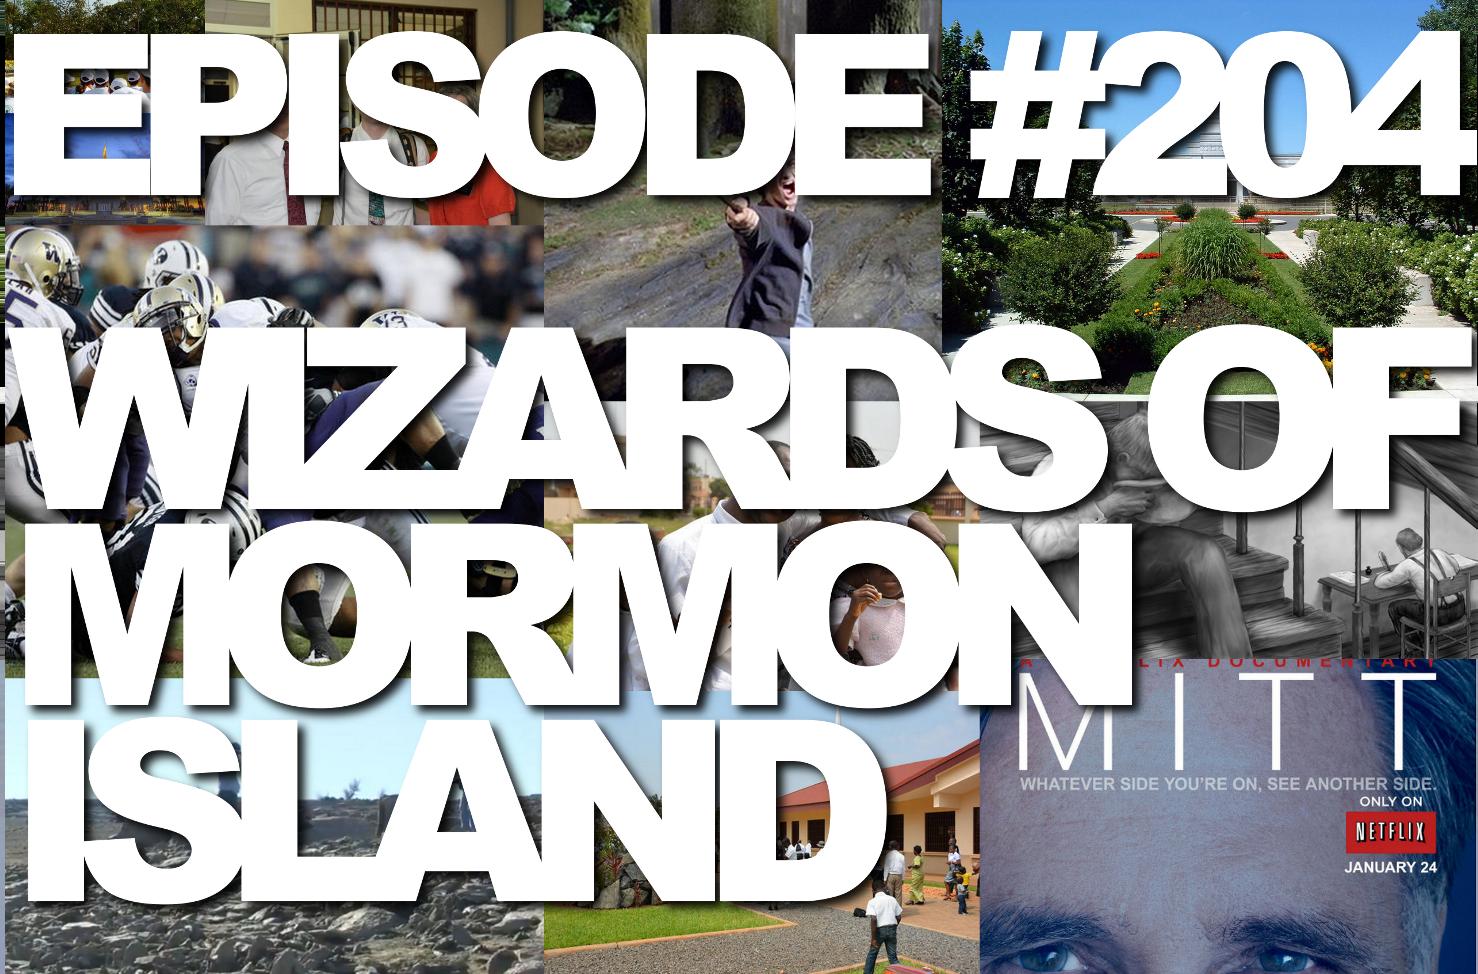 Episode #204 – Wizards of Mormon Island